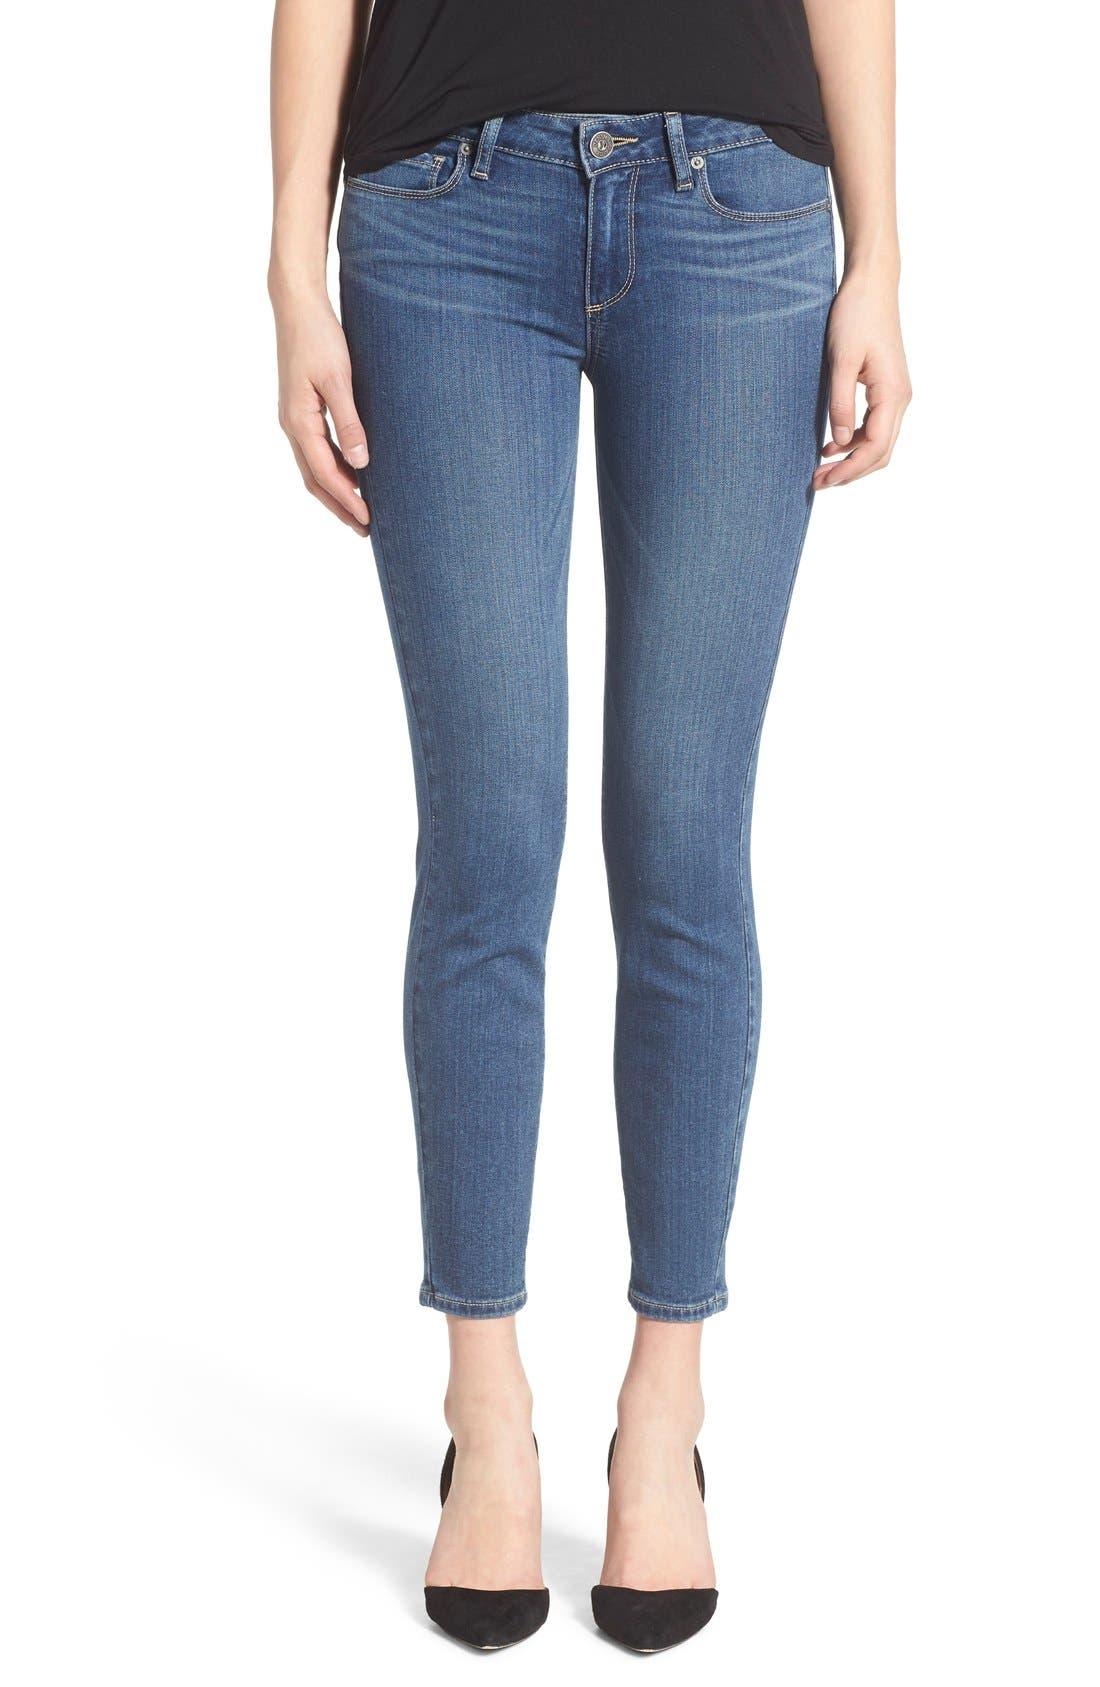 Alternate Image 1 Selected - Paige Denim 'Transcend - Verdugo' Crop Jeans (Nadeen)